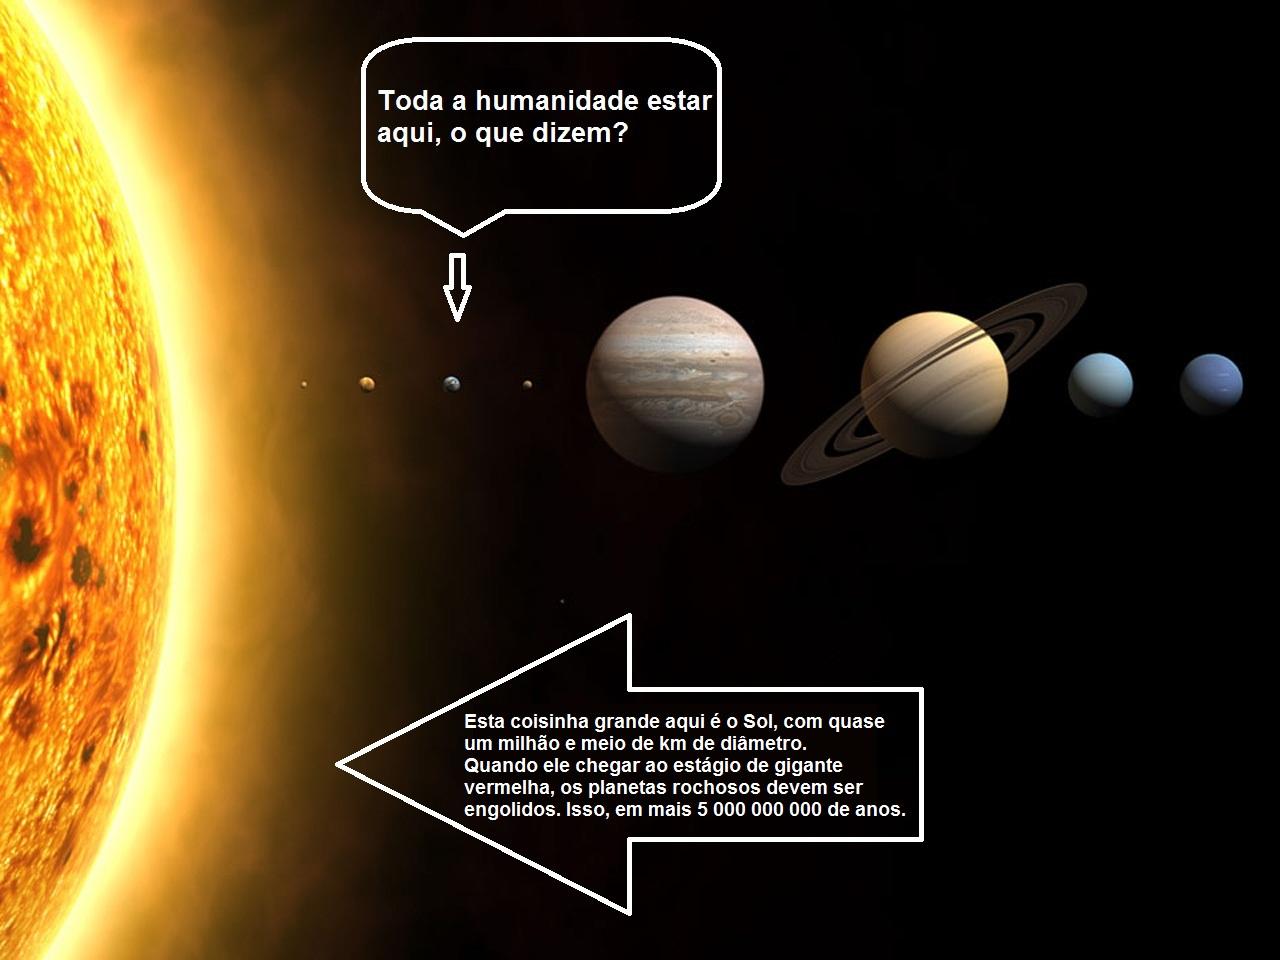 sistema-solar-planetas-e-sol